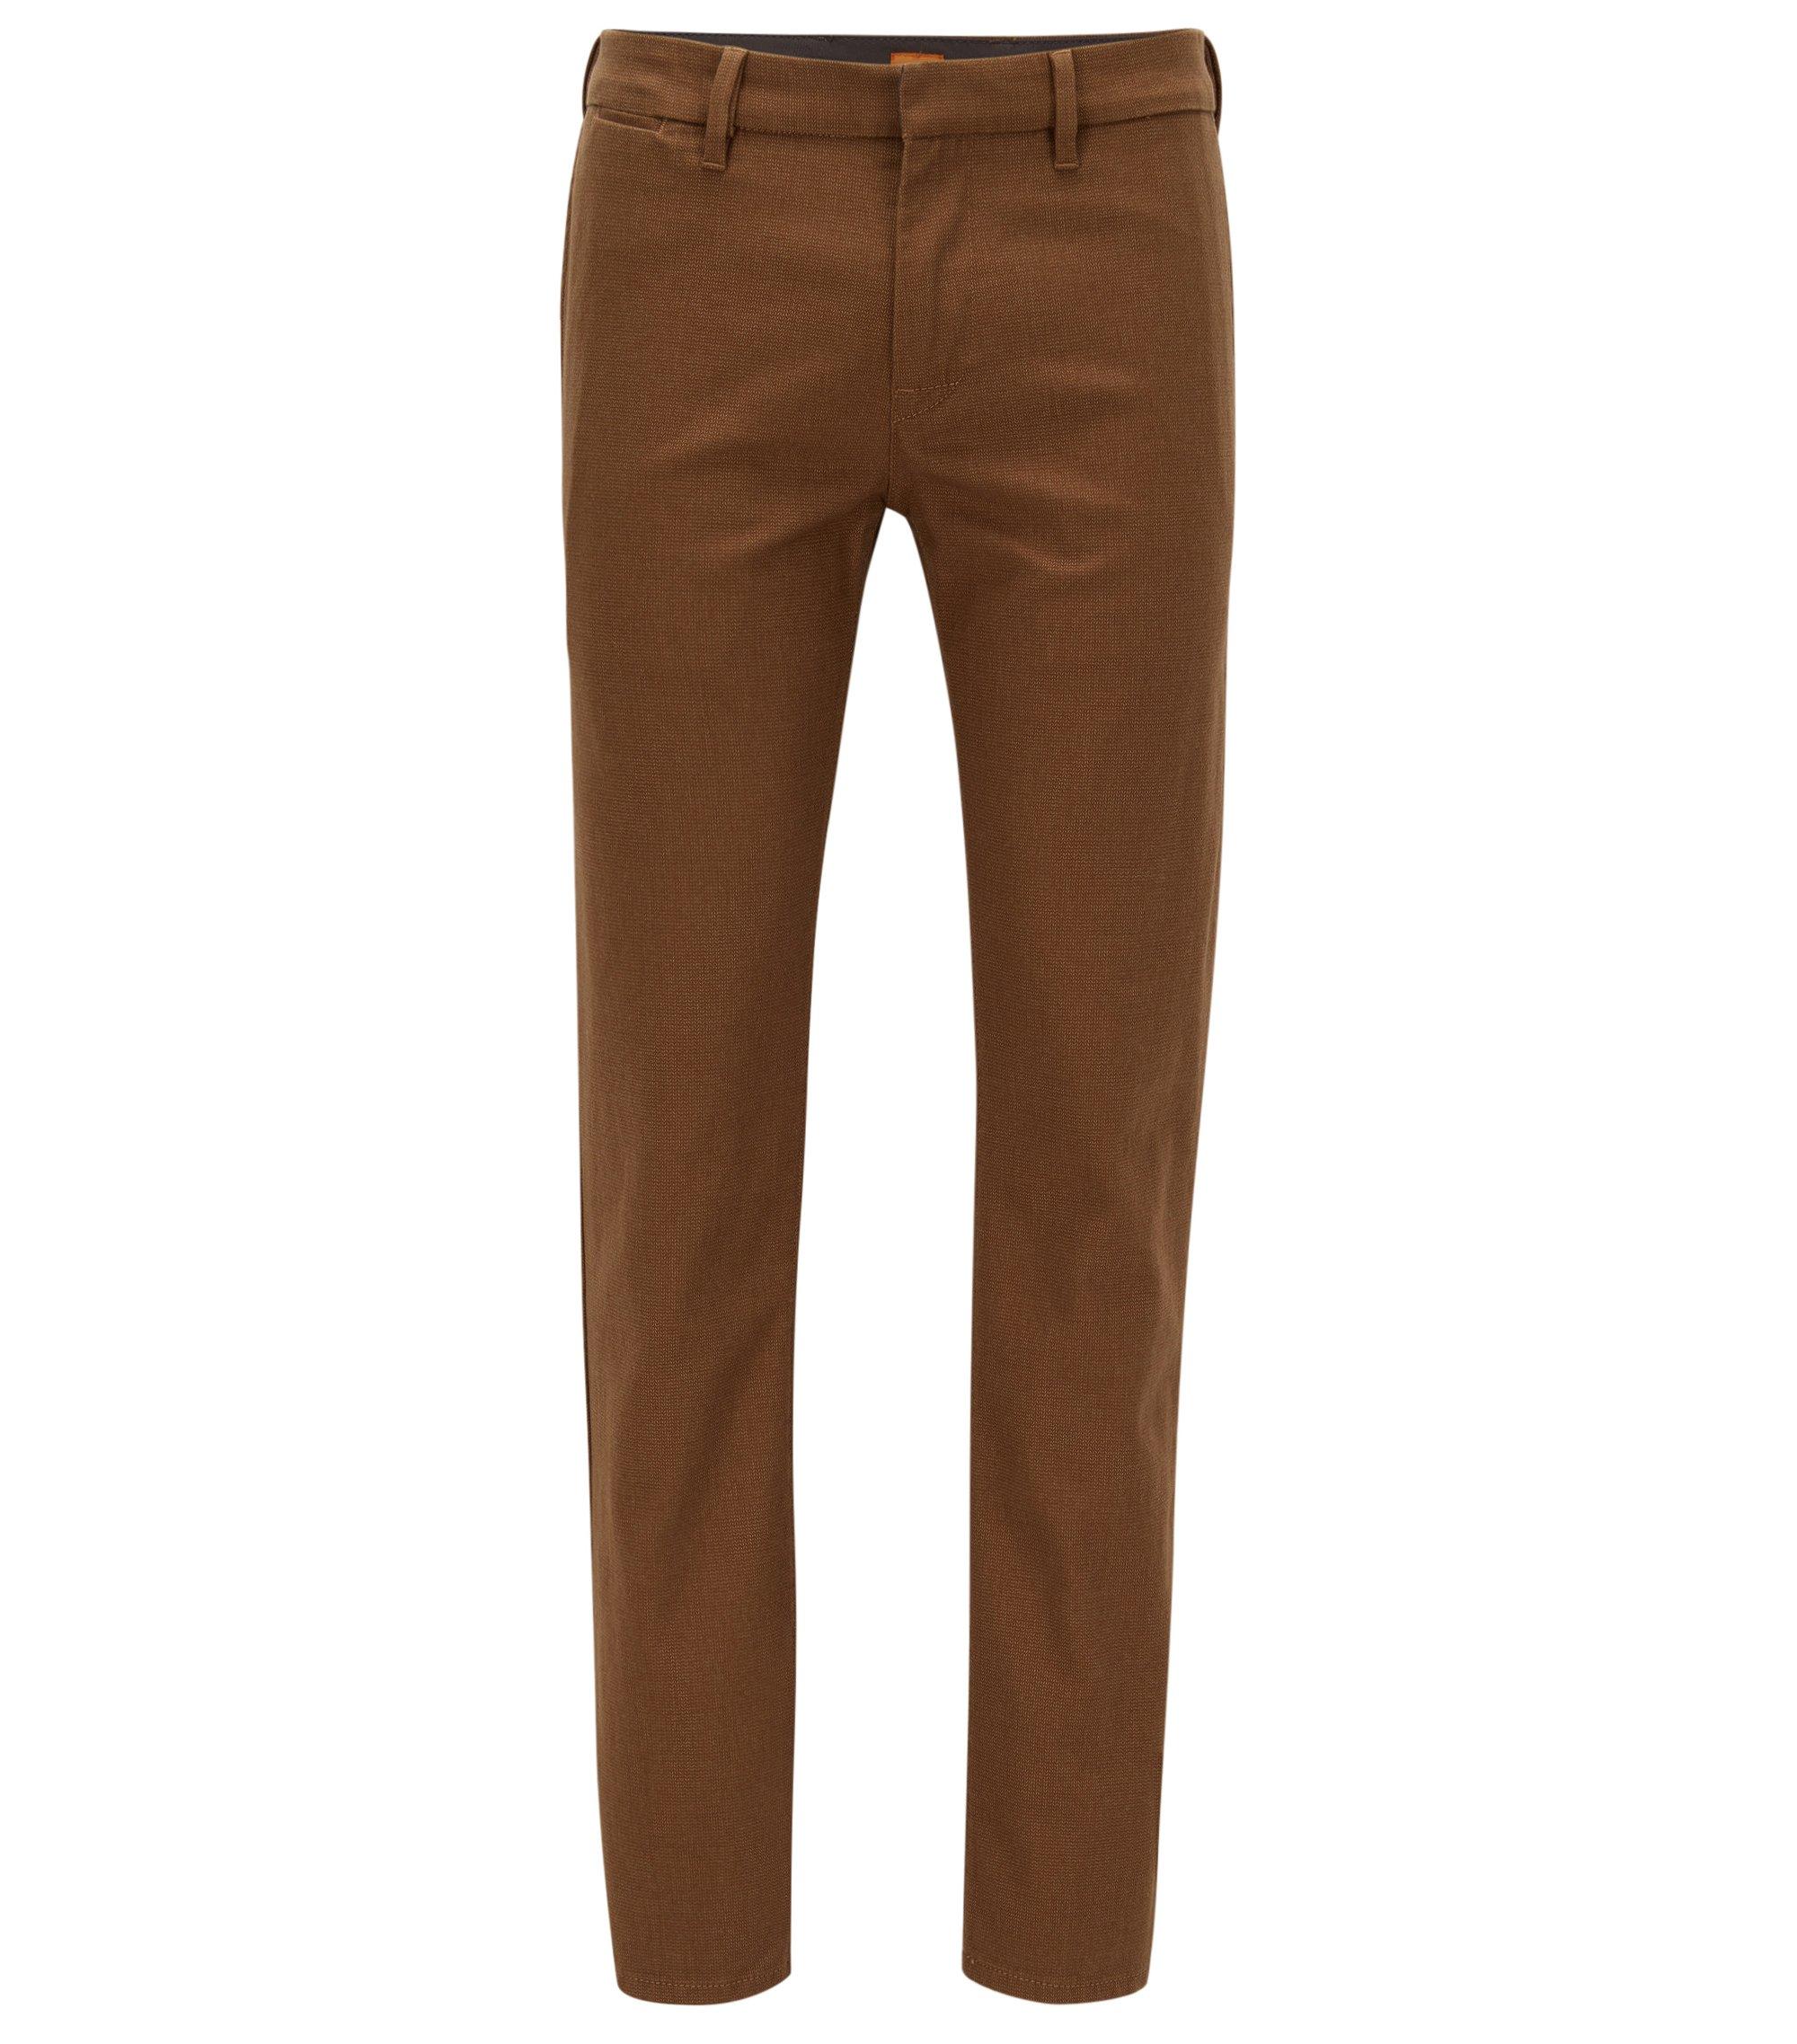 Stretch Cotton Pant, Slim Fit | Slim W, Open Beige